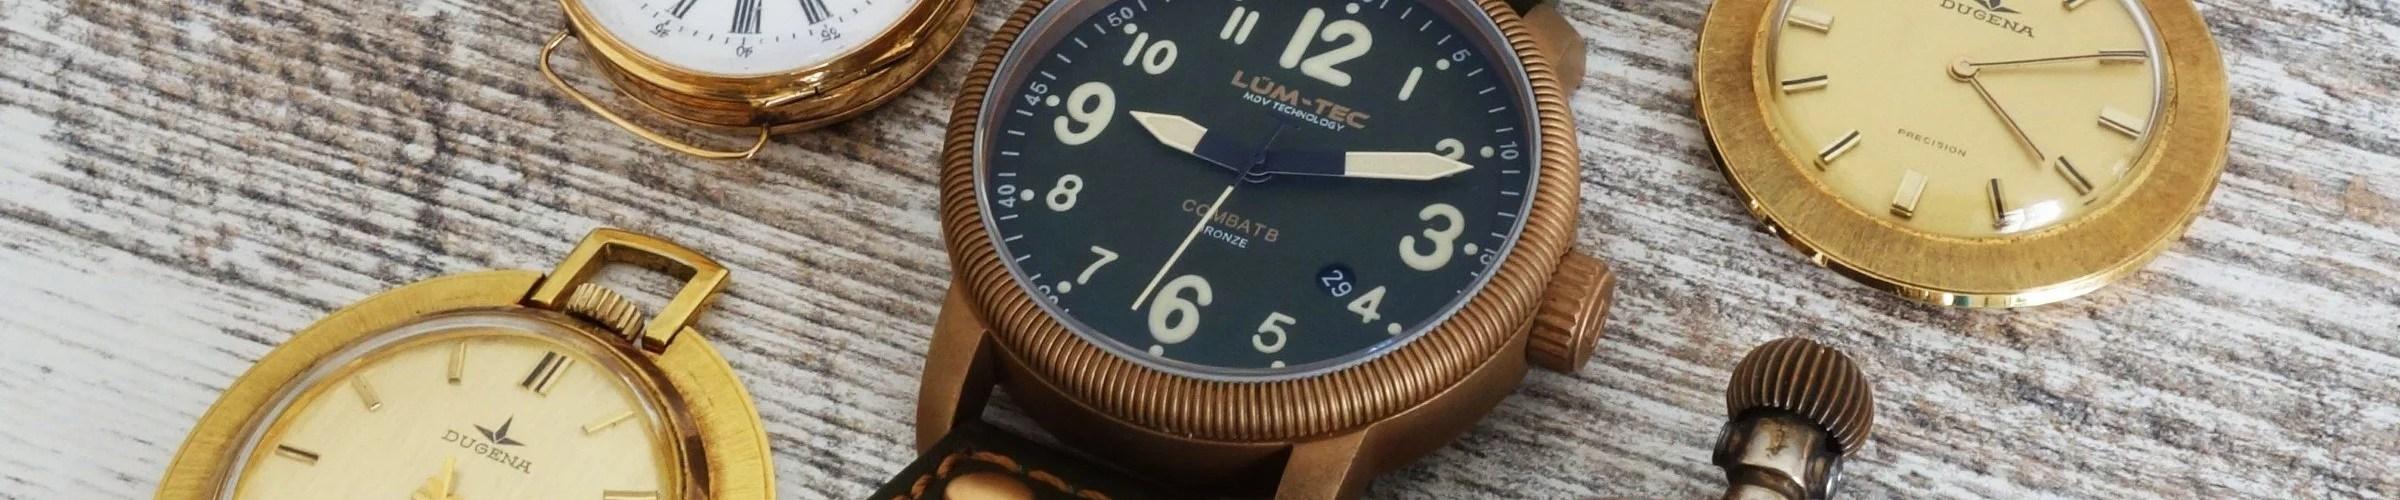 LÜM-TEC MDV Technology Vintage Bronze Watch (1)